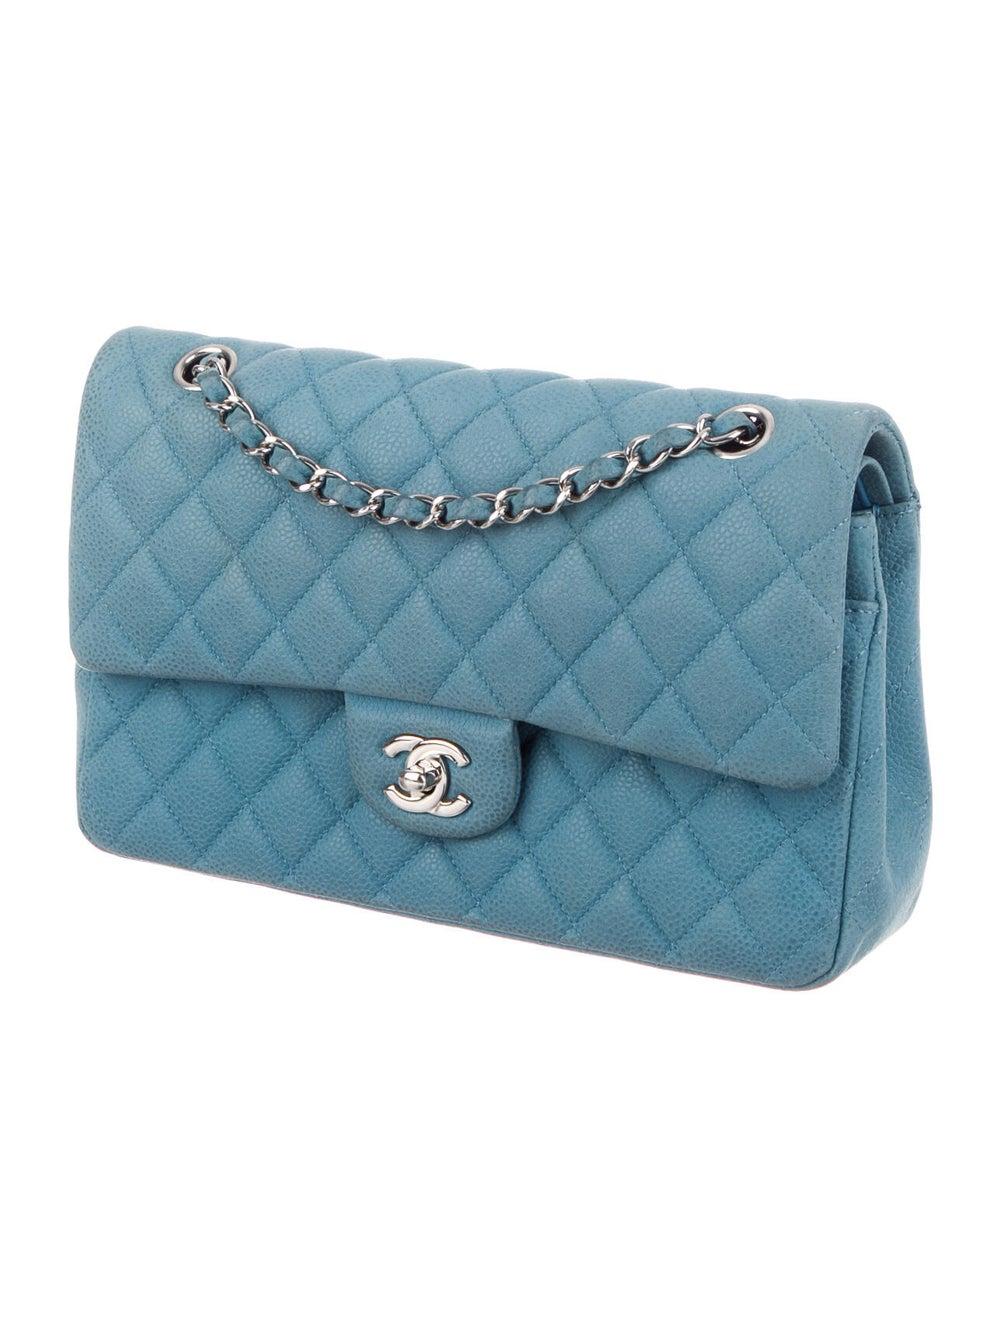 Chanel Nubuck Medium Classic Double Flap Bag Blue - image 3